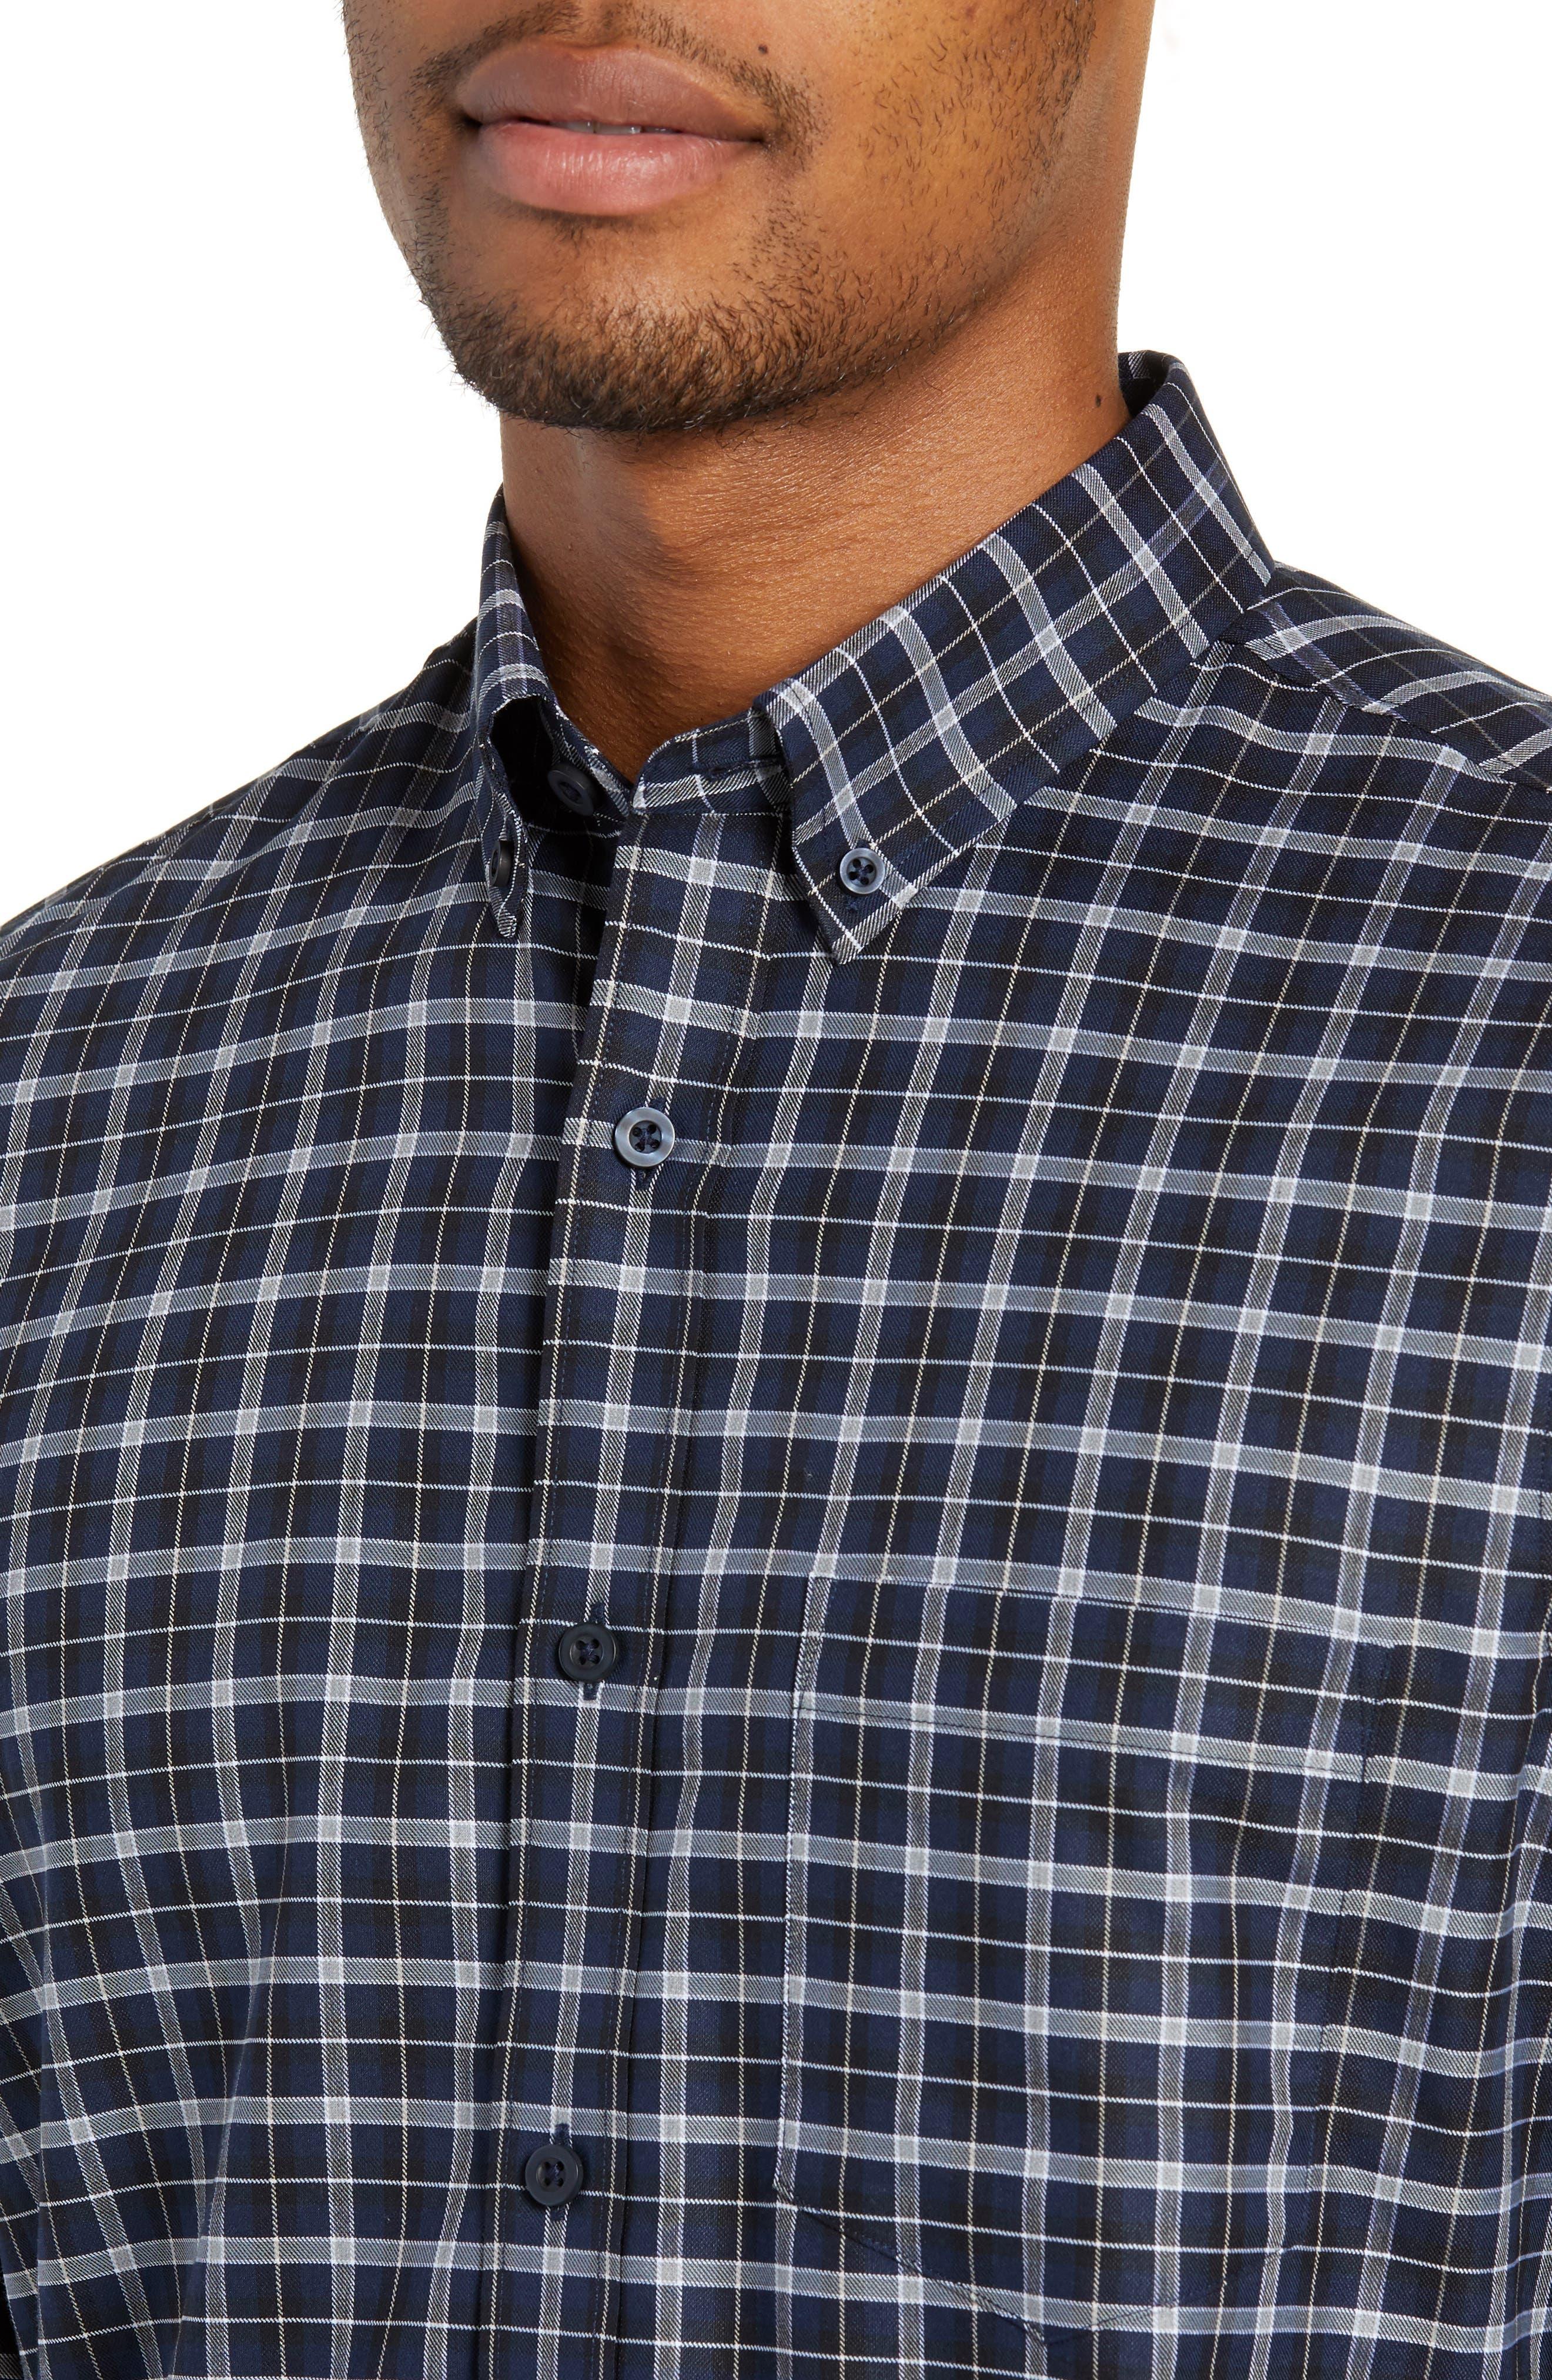 NORDSTROM MEN'S SHOP, Tech-Smart Slim Fit Check Sport Shirt, Alternate thumbnail 2, color, NAVY IRIS BLACK CHECK